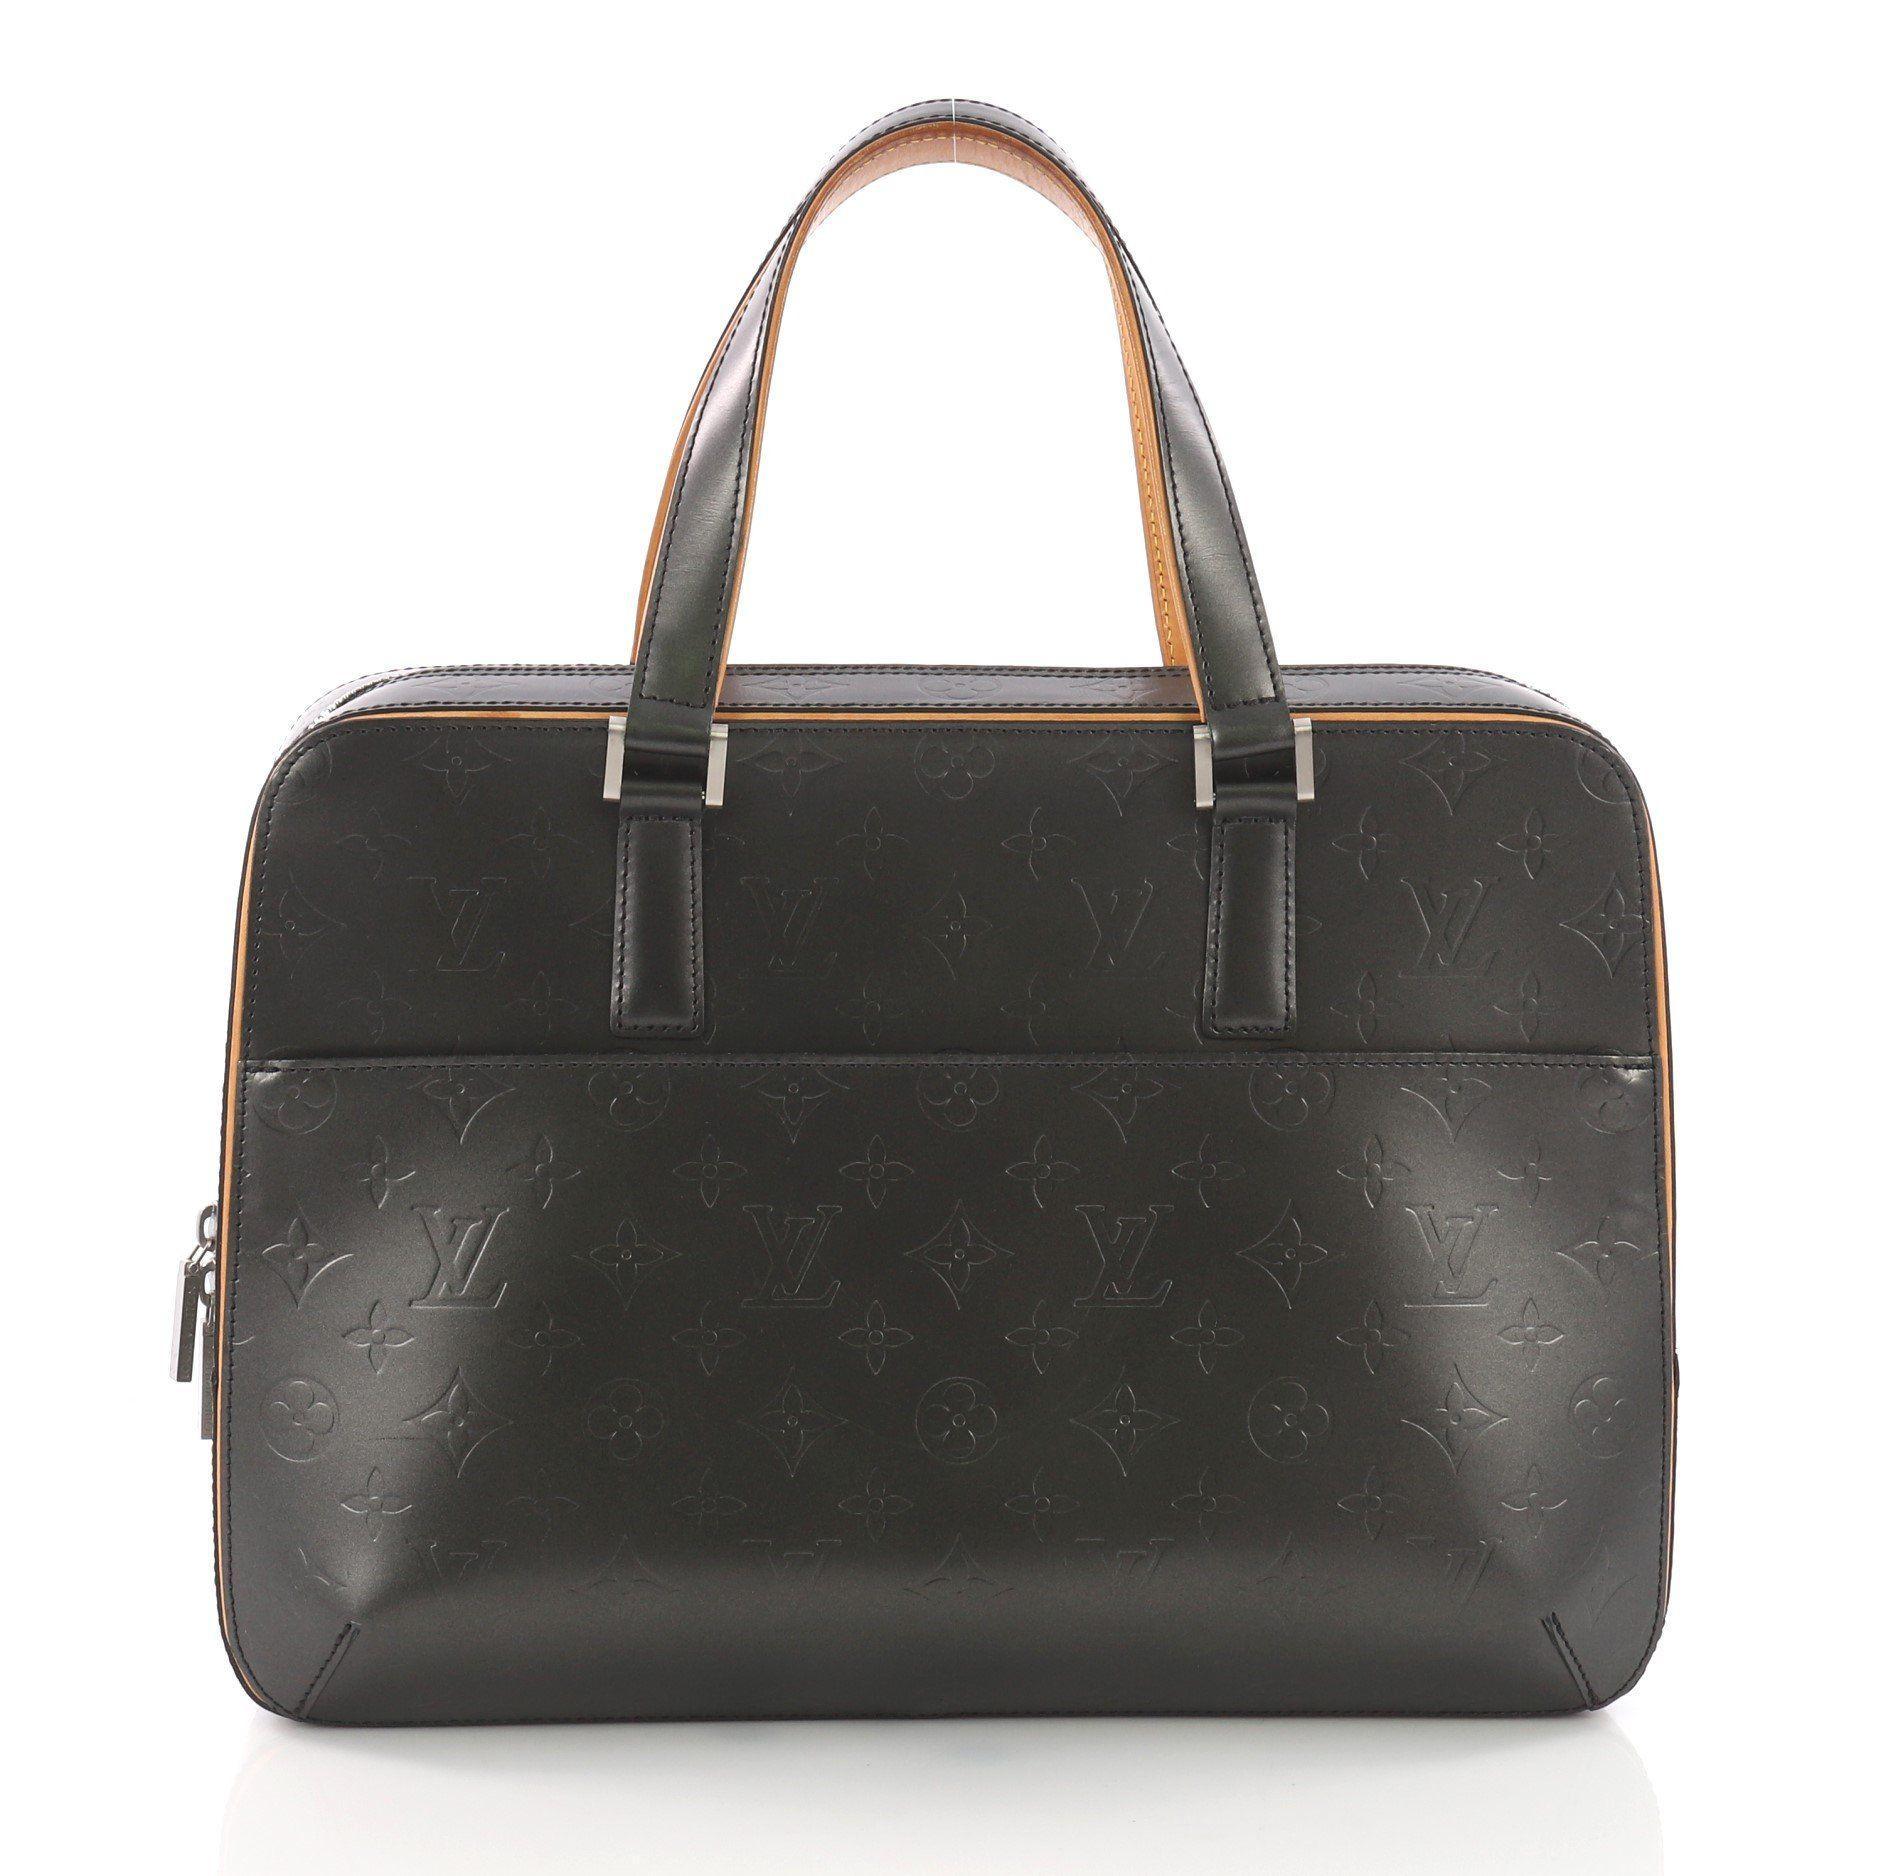 bfd25e9e1c1f Louis Vuitton. Women s Black Pre Owned Mat Malden Handbag Monogram Vernis